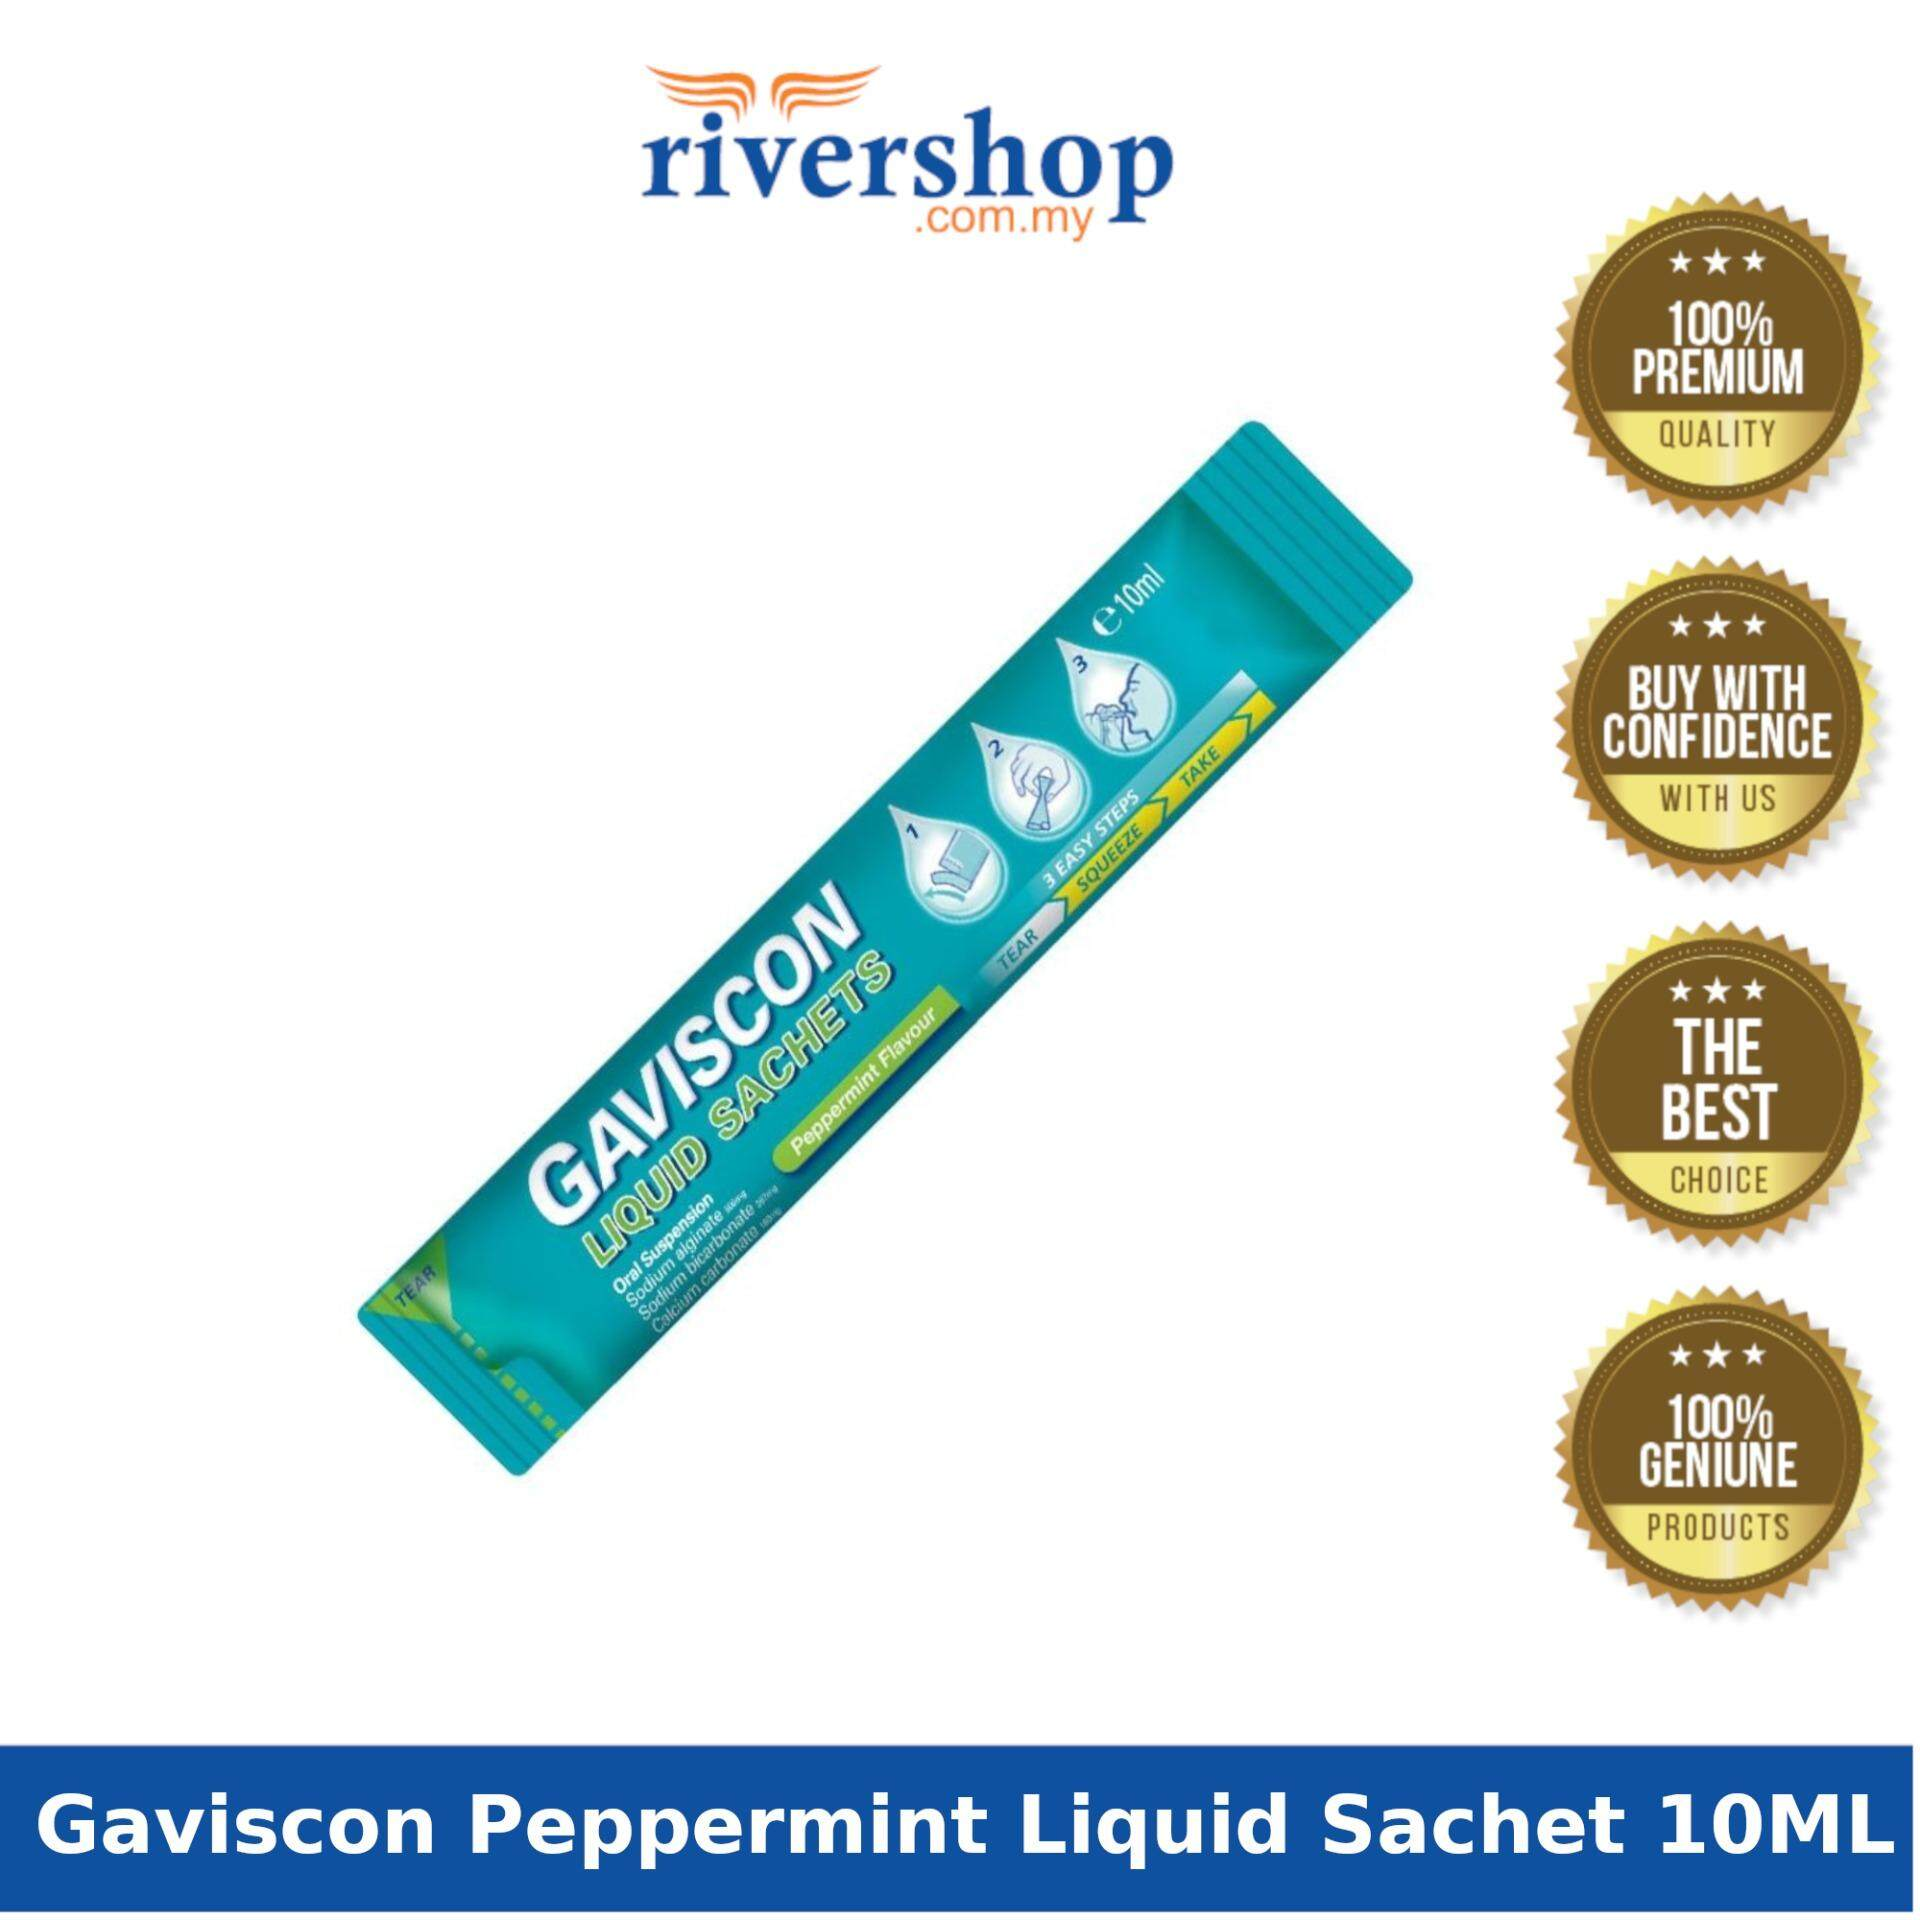 Gaviscon Peppermint Liquid Sachet 10ML